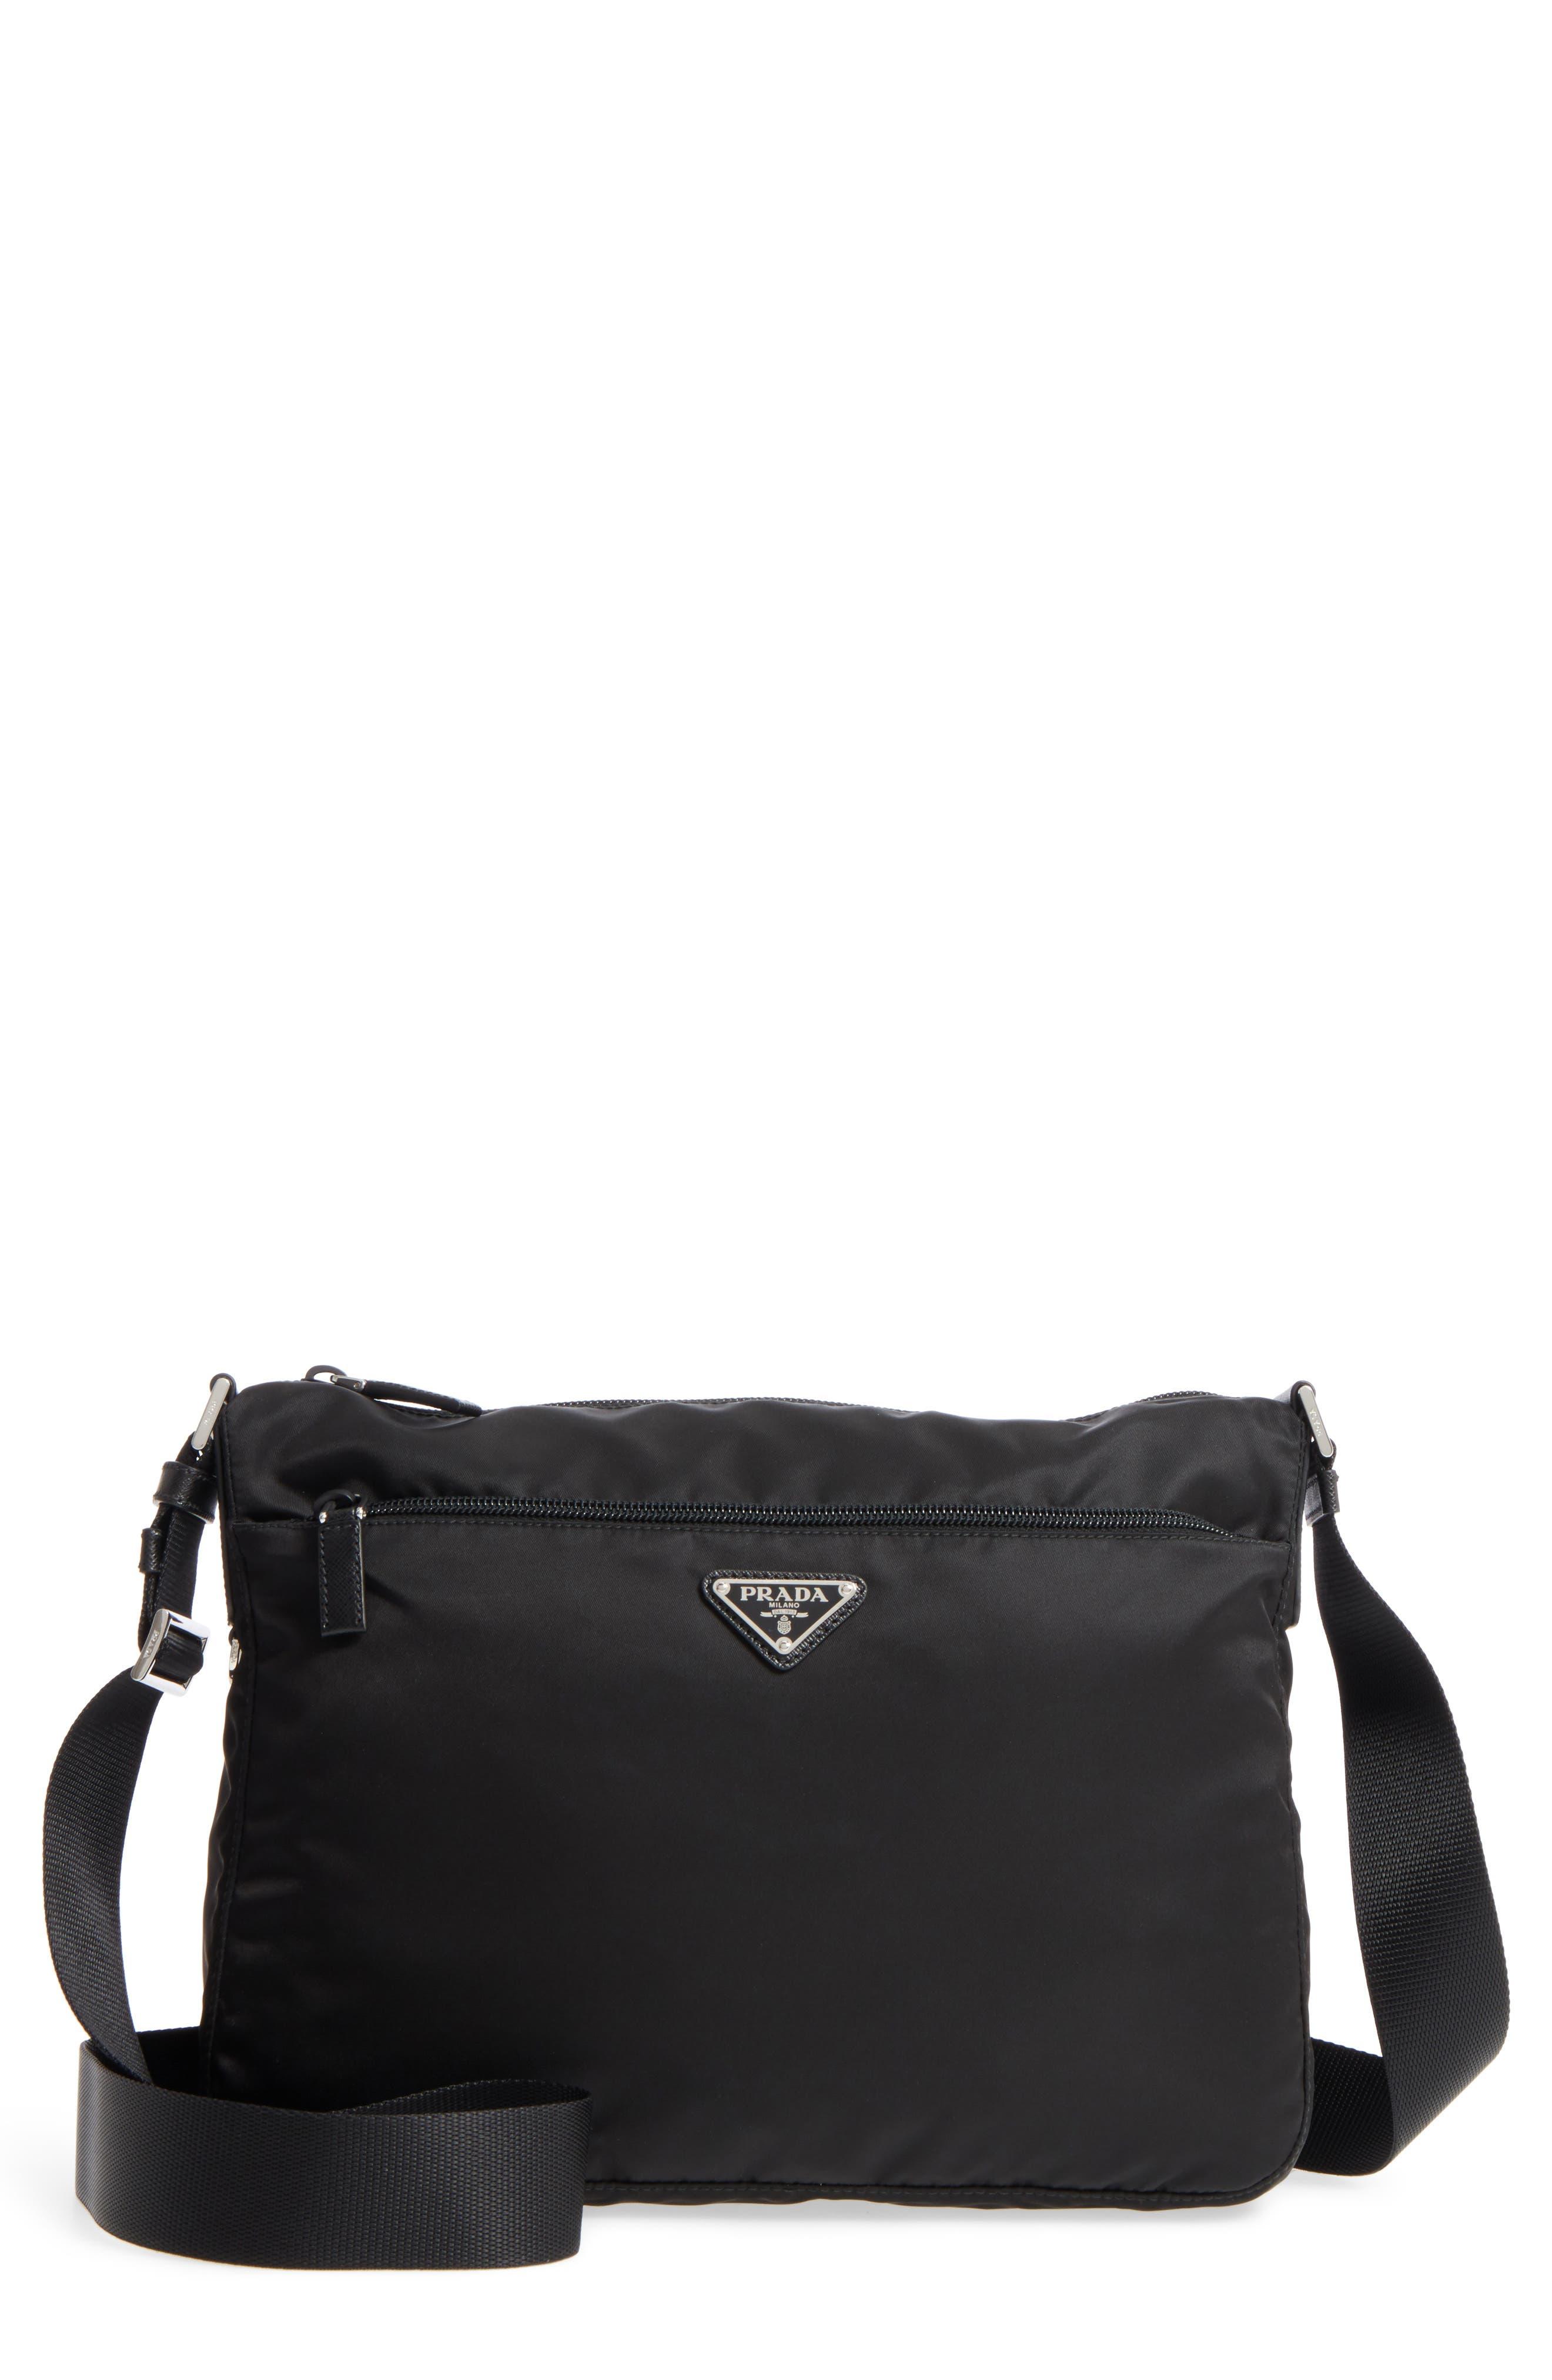 87d99889820f Prada Crossbody Bags | Nordstrom